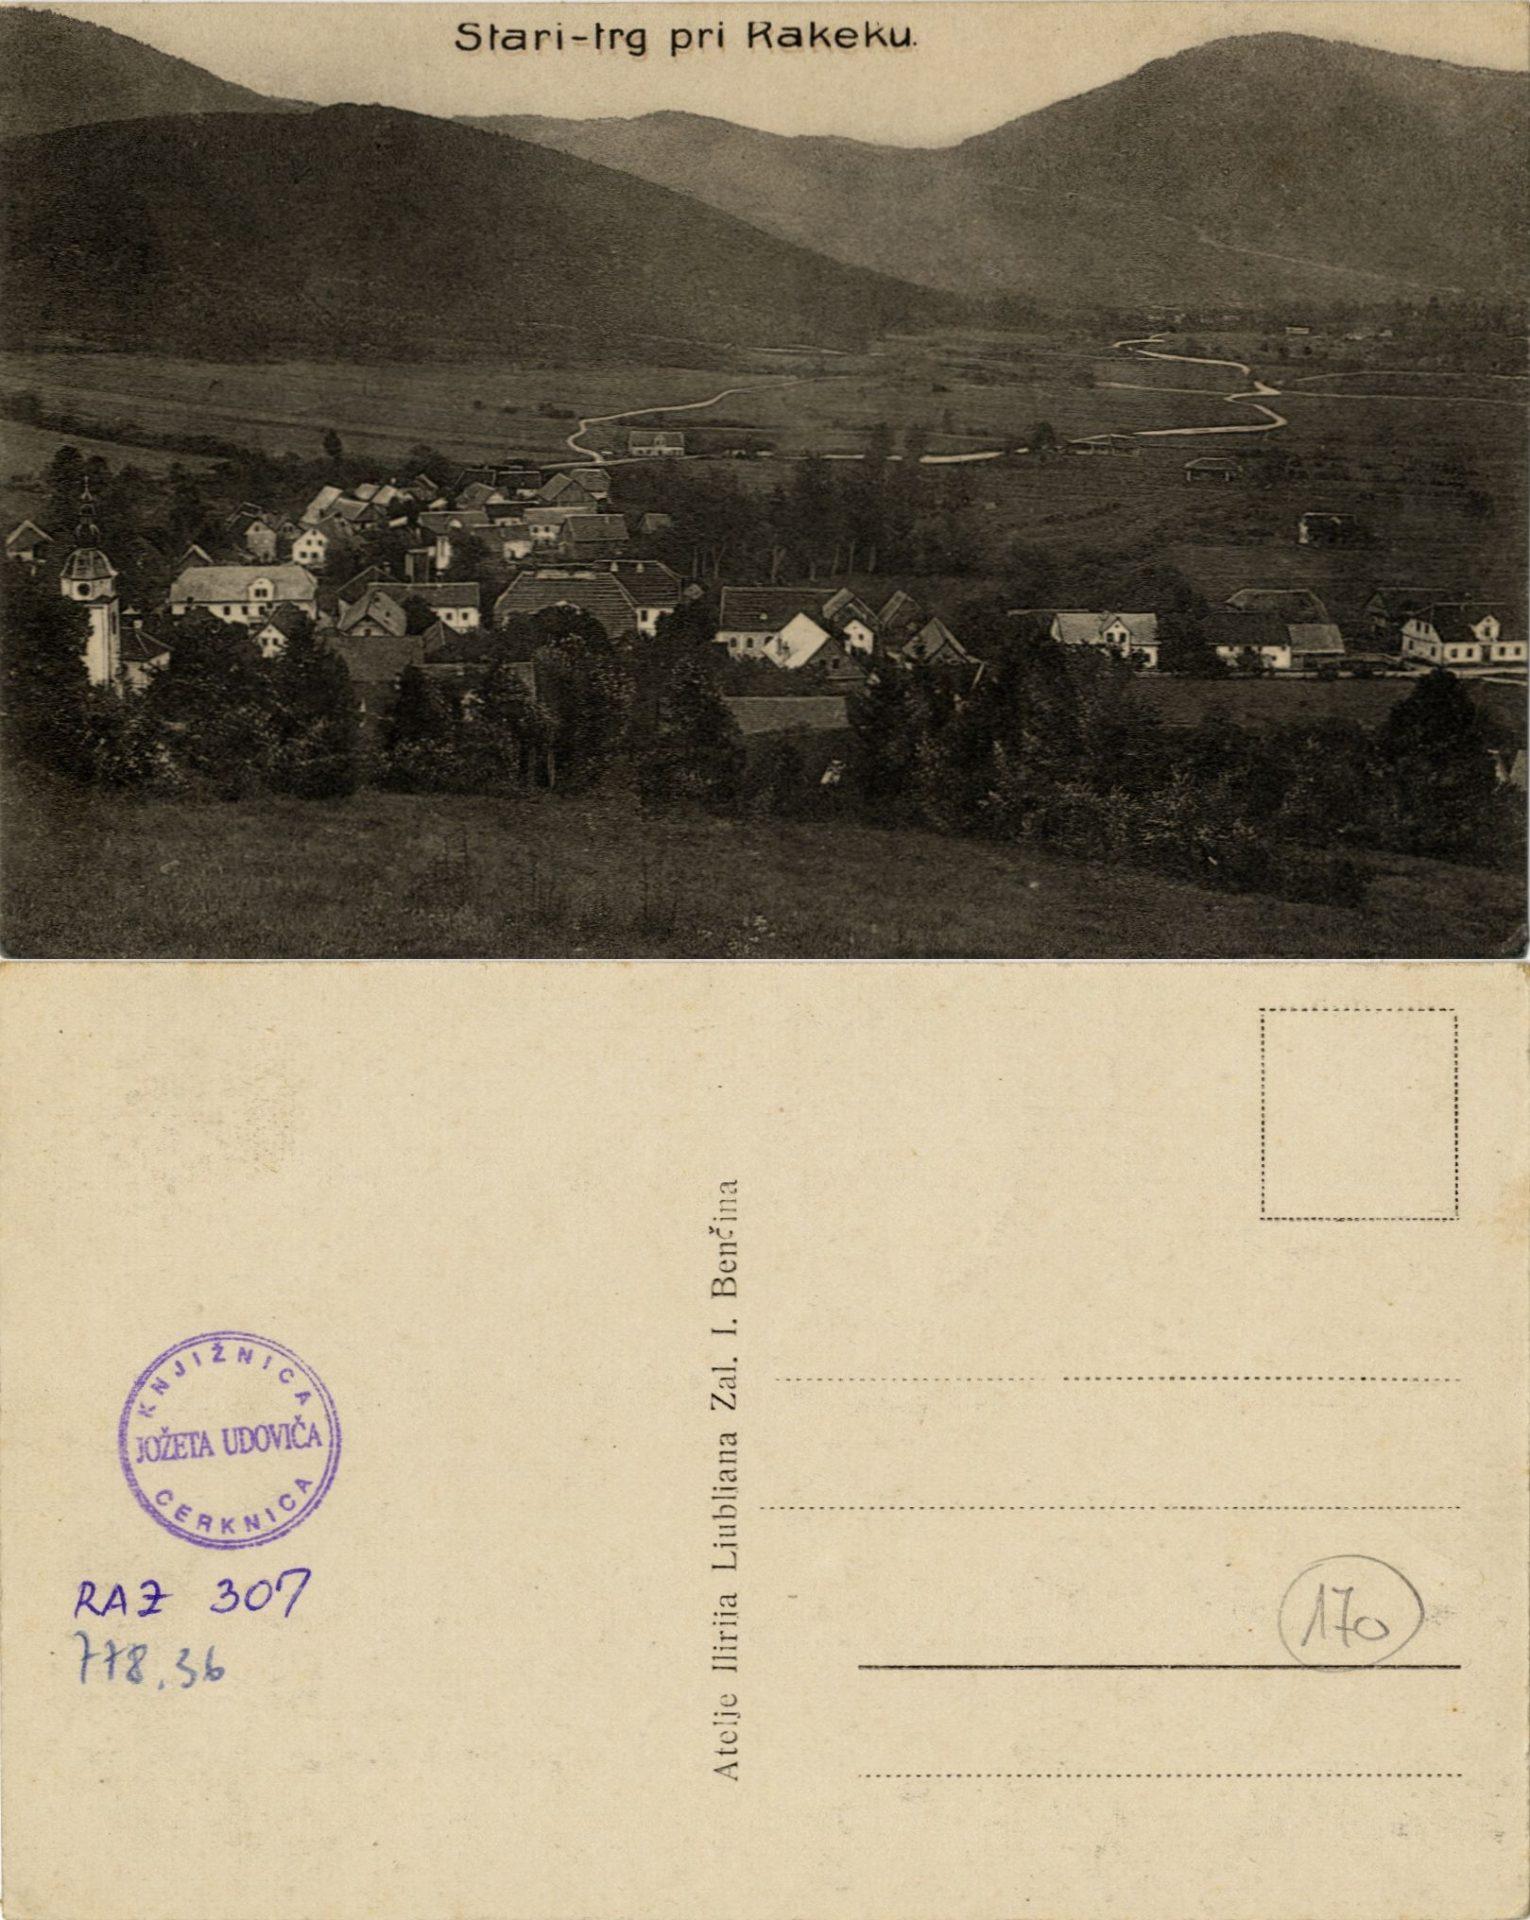 zlimano - Stari trg